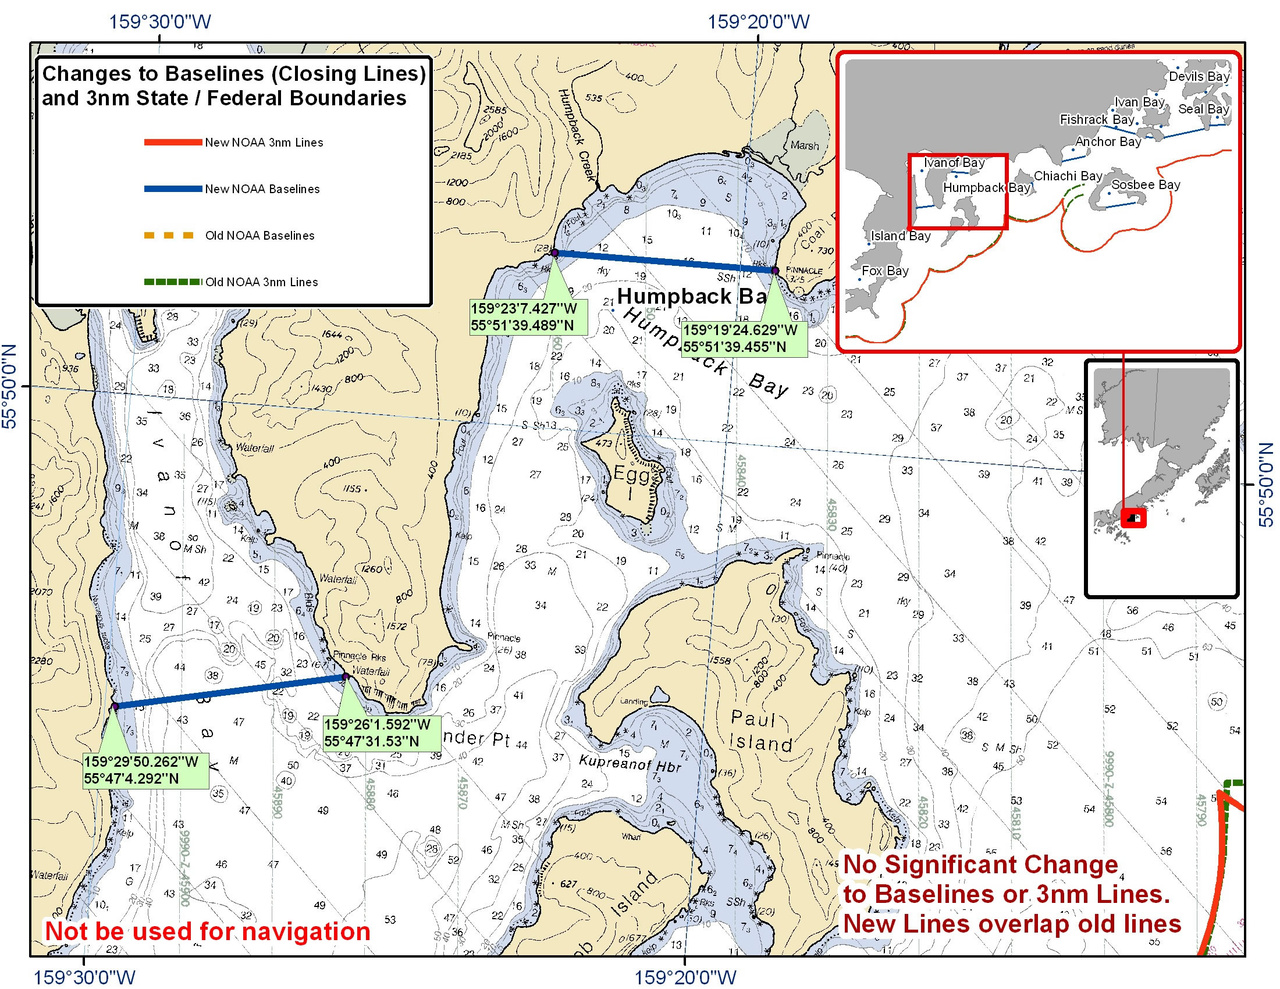 Chart for Ivanof Bay and Humpback Bay